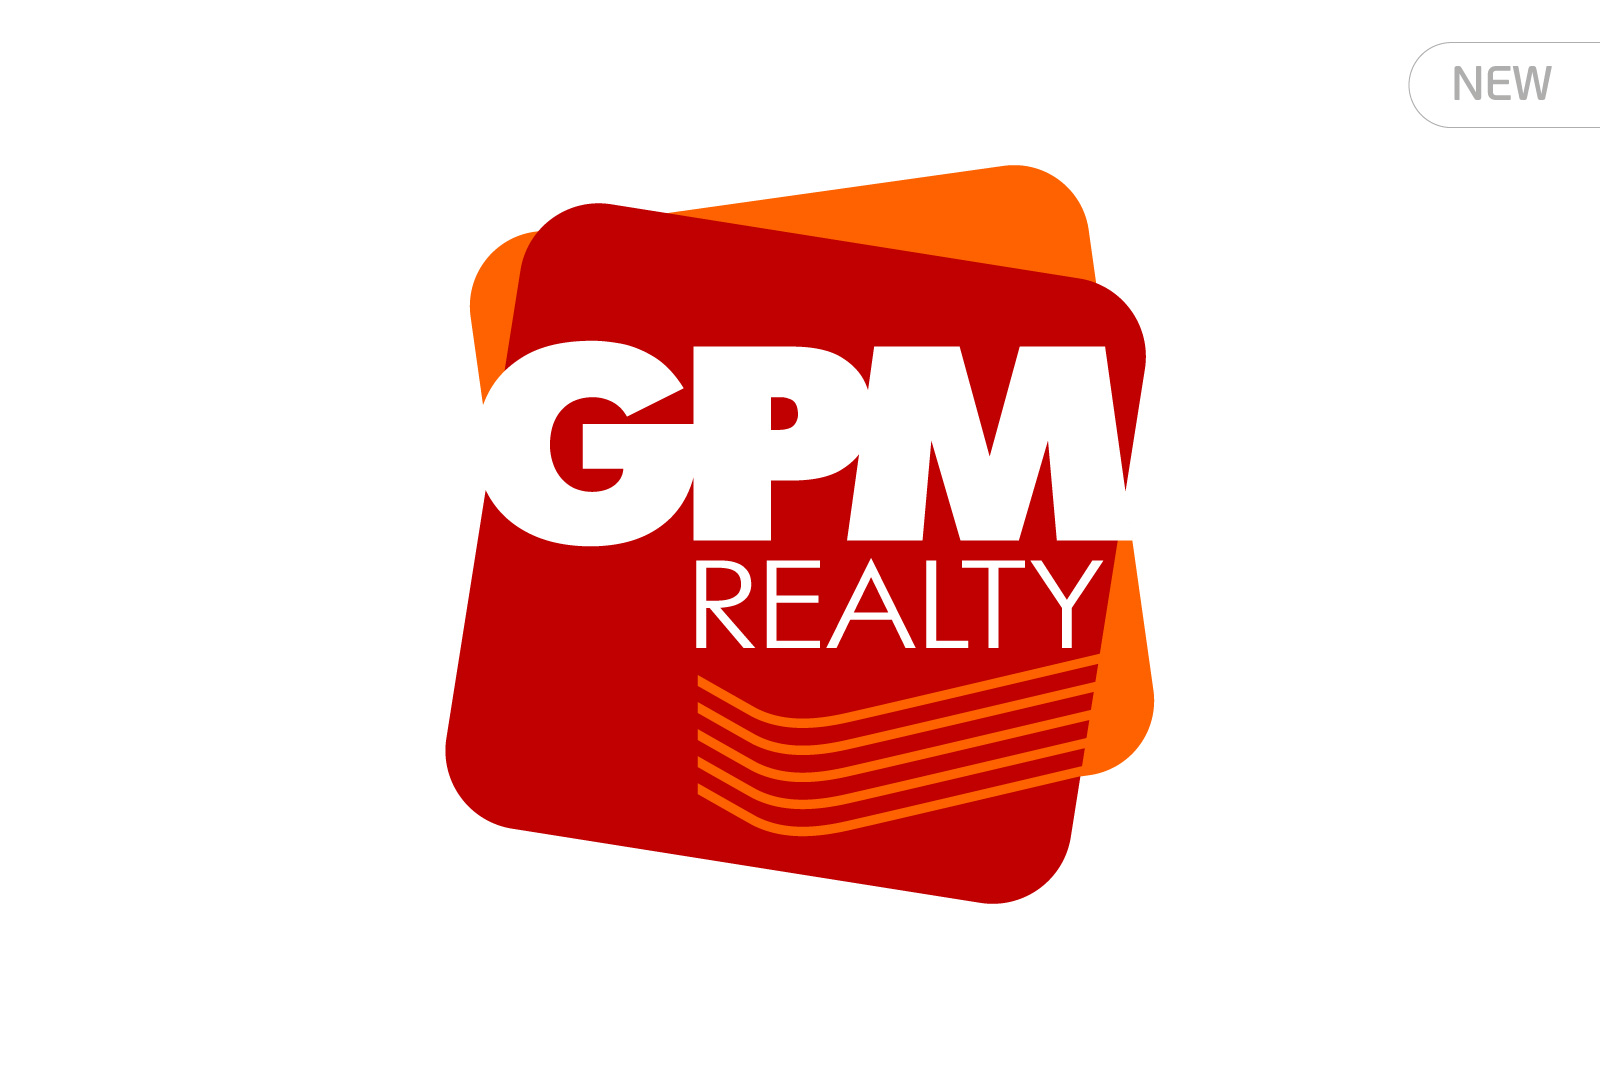 Asgard Branding, corporate identity, new logo design, GPM Realty, development branding, Uzbekistan